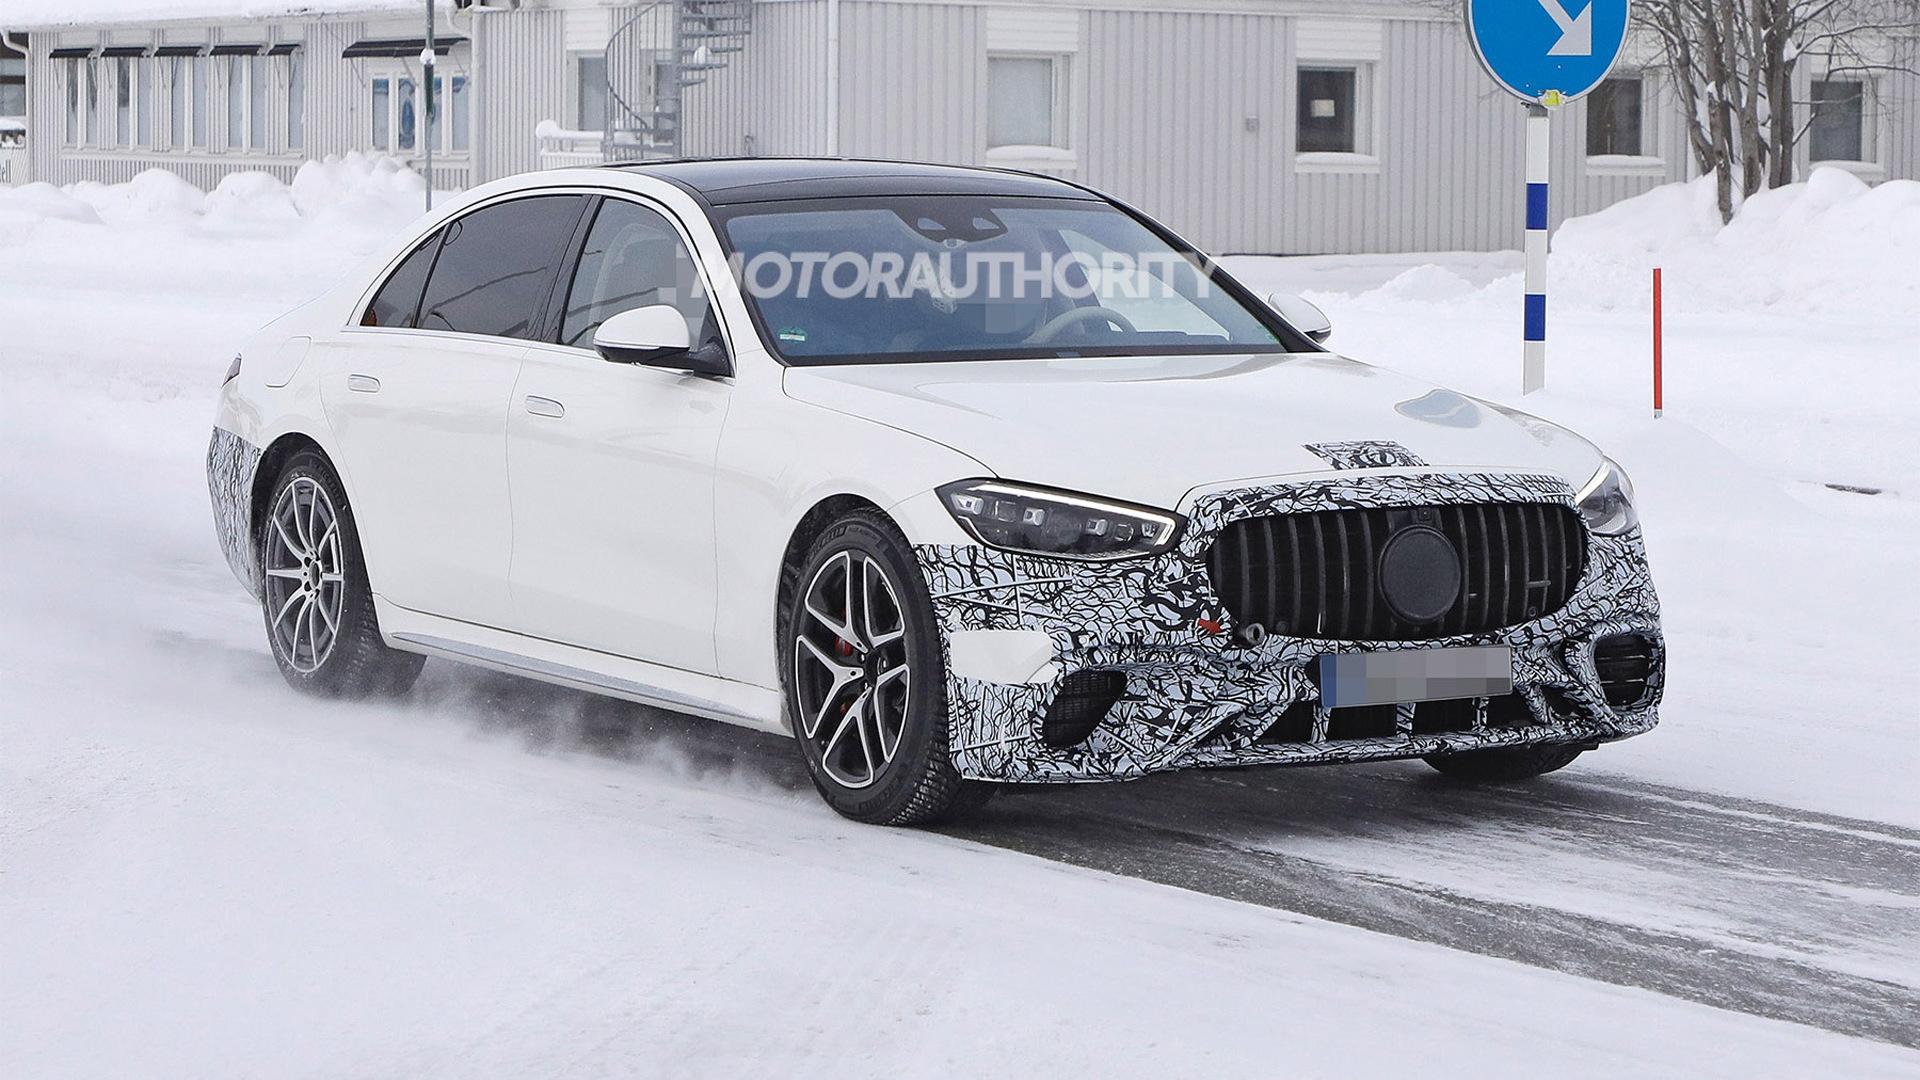 2022 Mercedes-Benz AMG S63e spy shots - Photo credit: S. Baldauf/SB-Medien